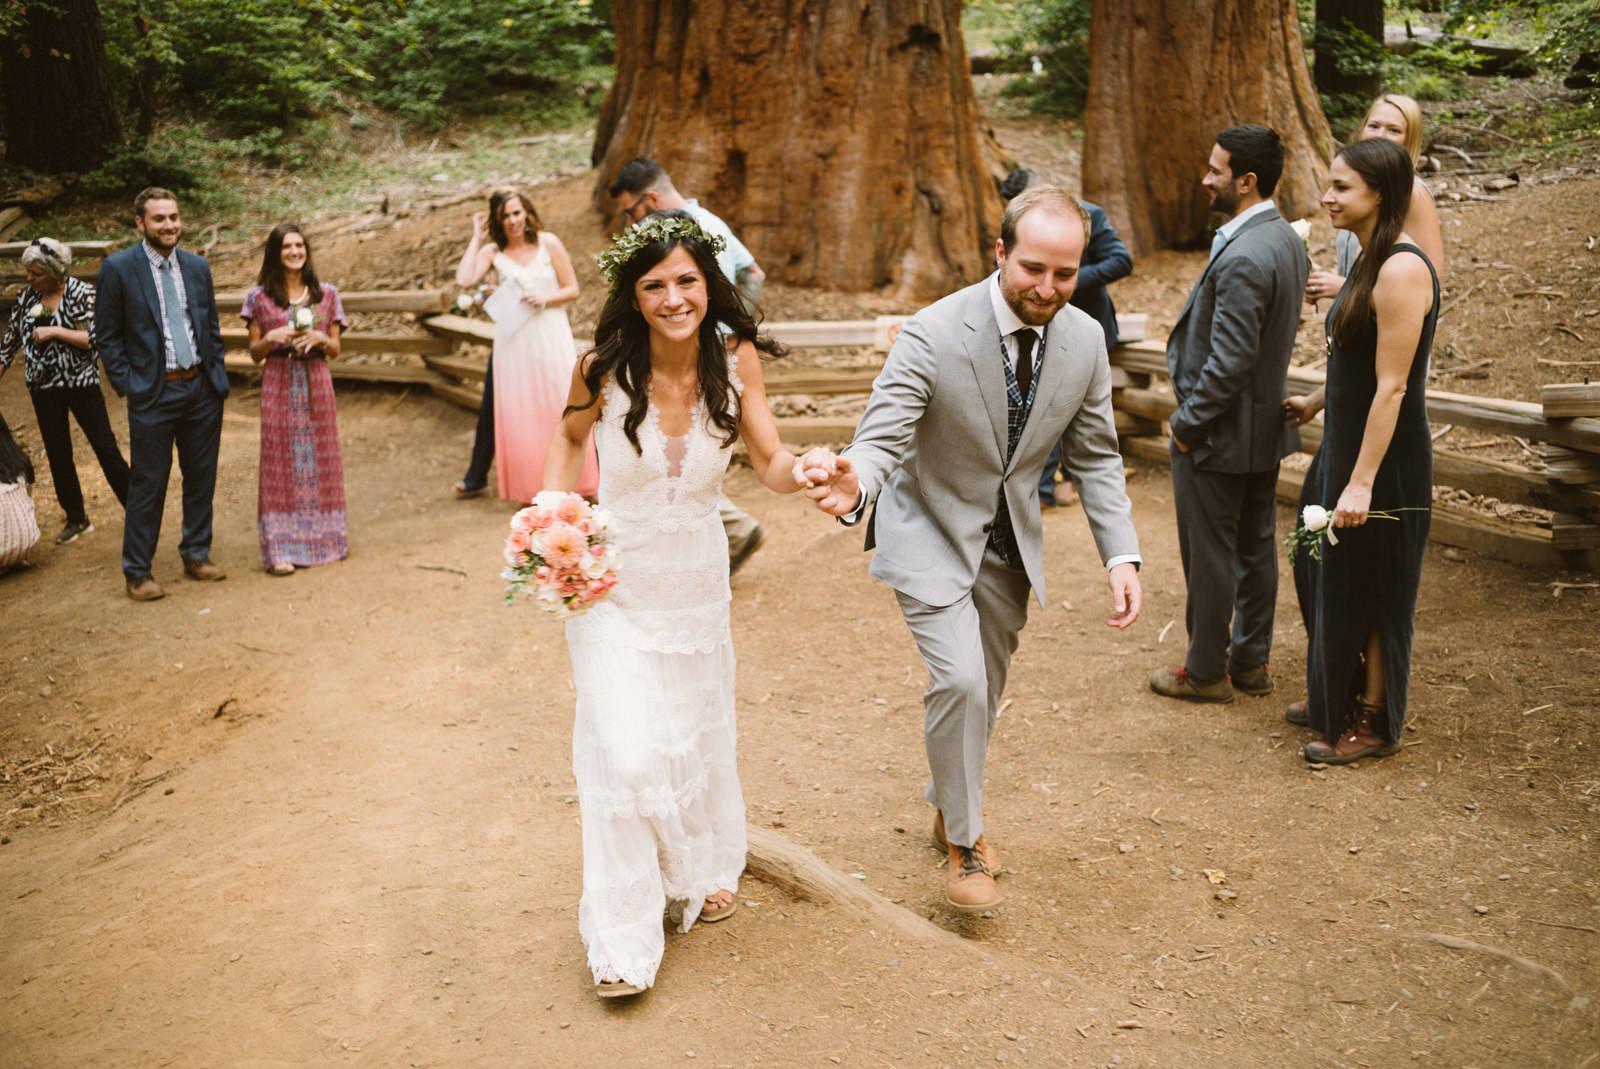 yosemite-intimate-wedding-068 YOSEMITE INTIMATE WEDDING